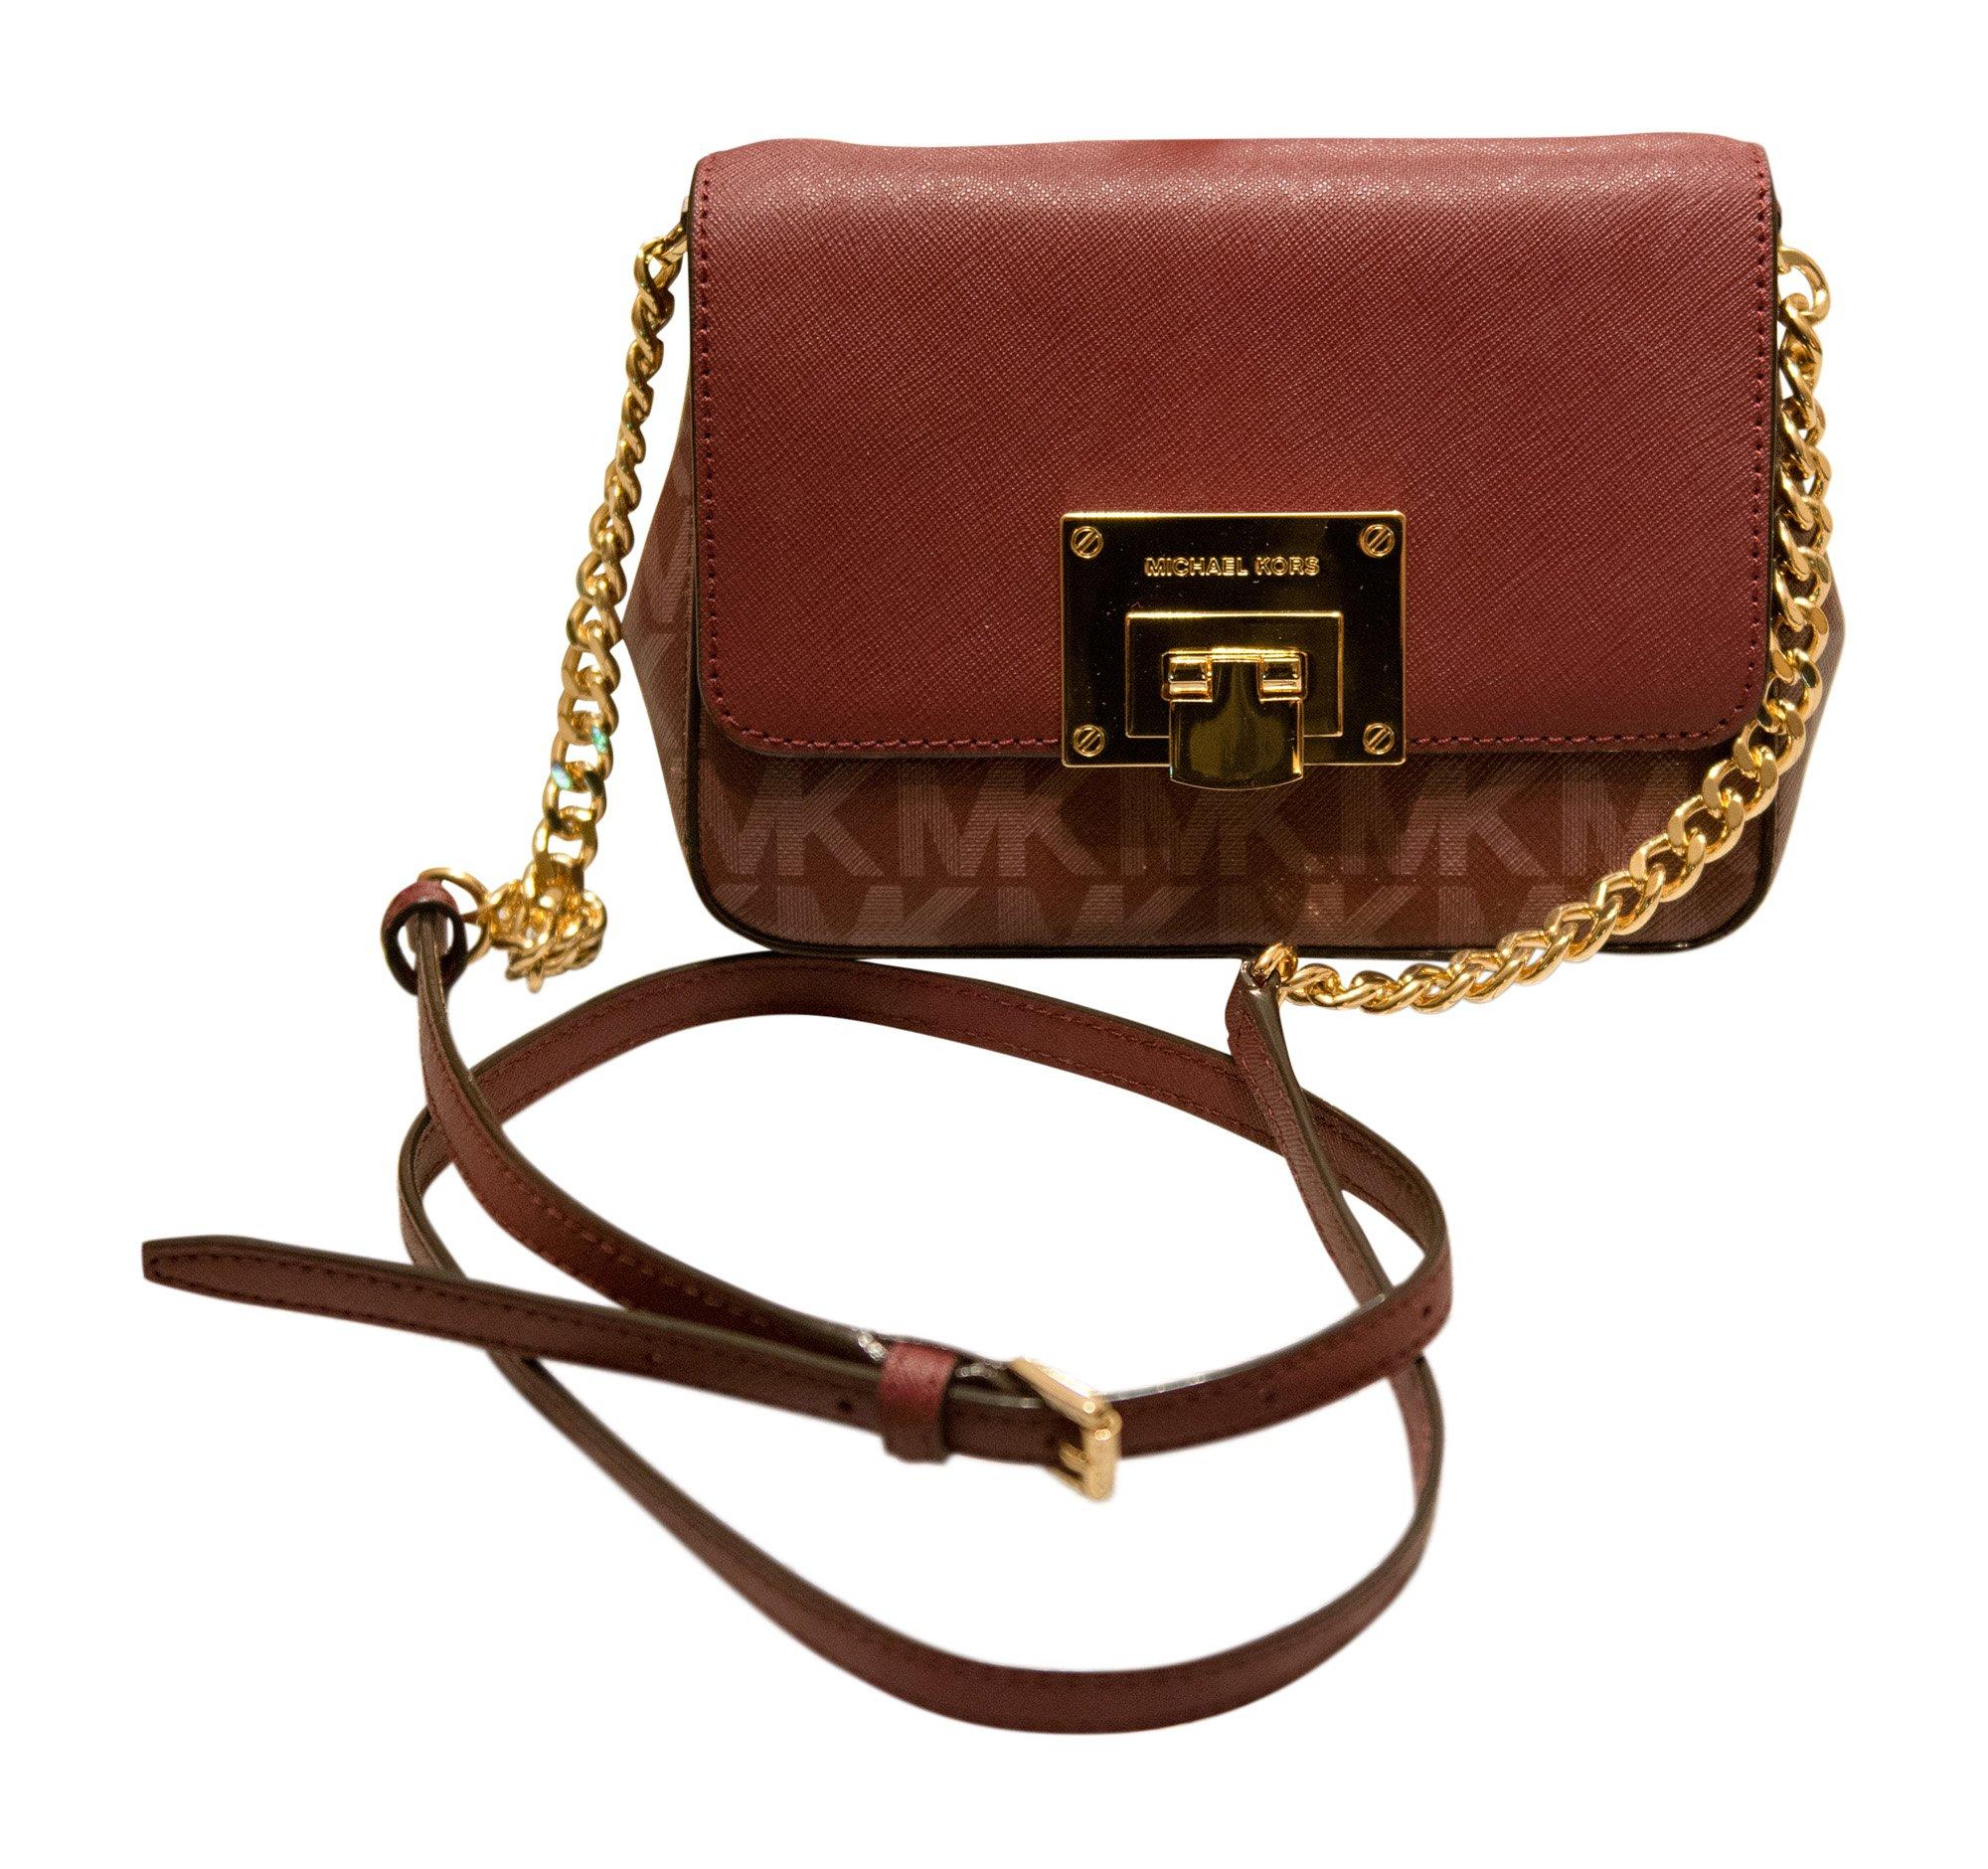 Michael Kors Tina Small Leather Clutch, Crossbody Shoulder Bag, Merlot